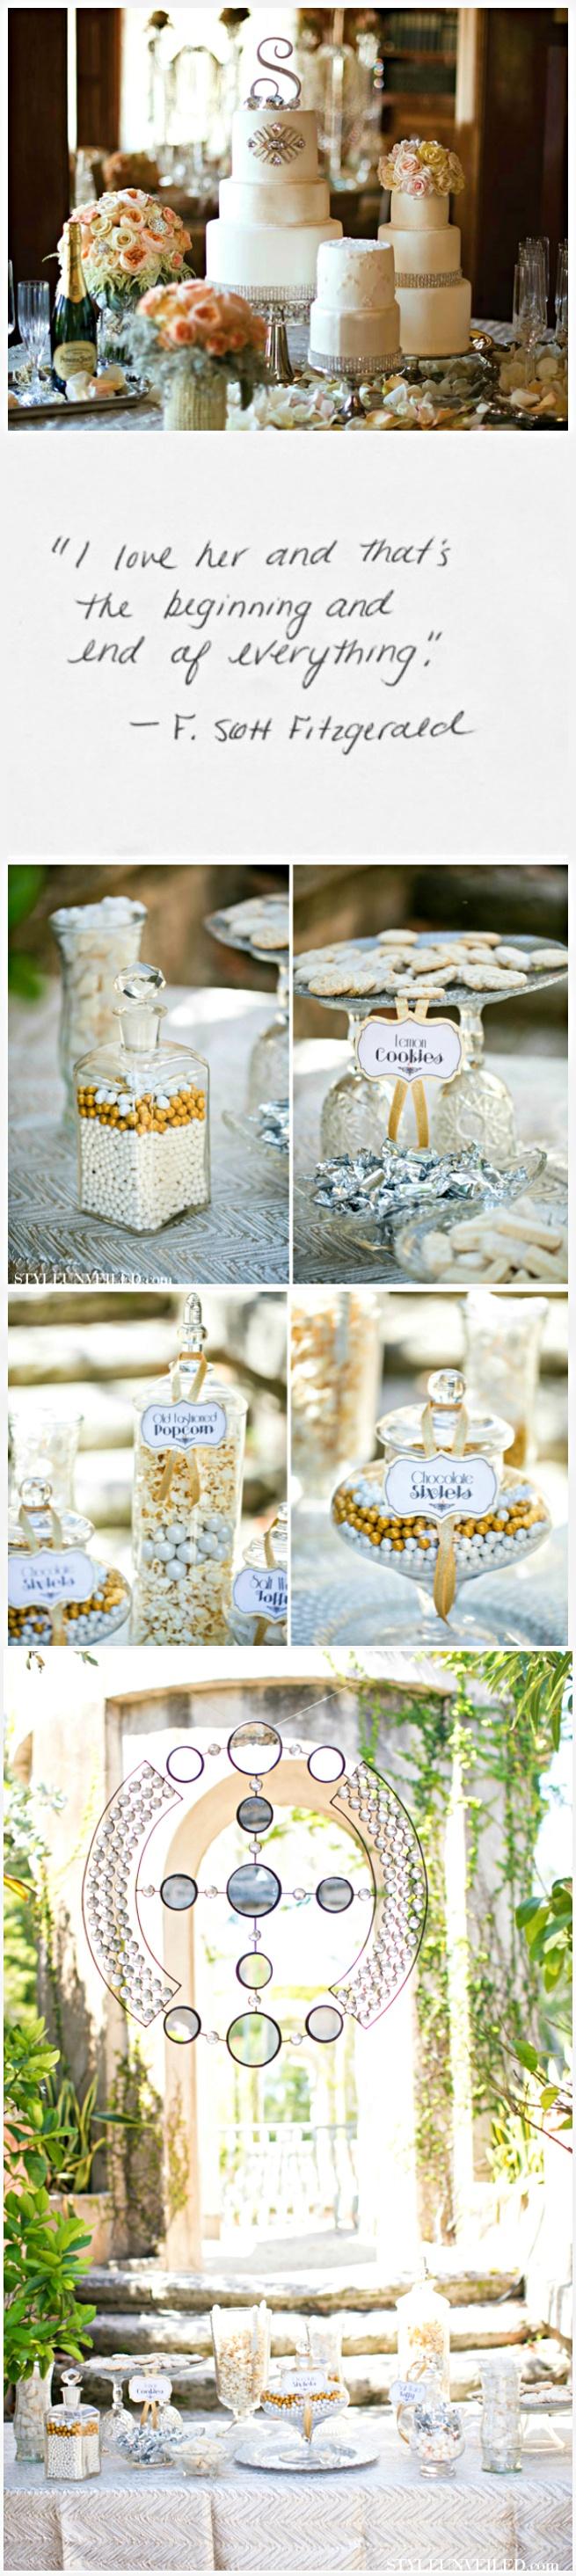 93 best Summer Wedding Karla images on Pinterest   Bridal shower ...